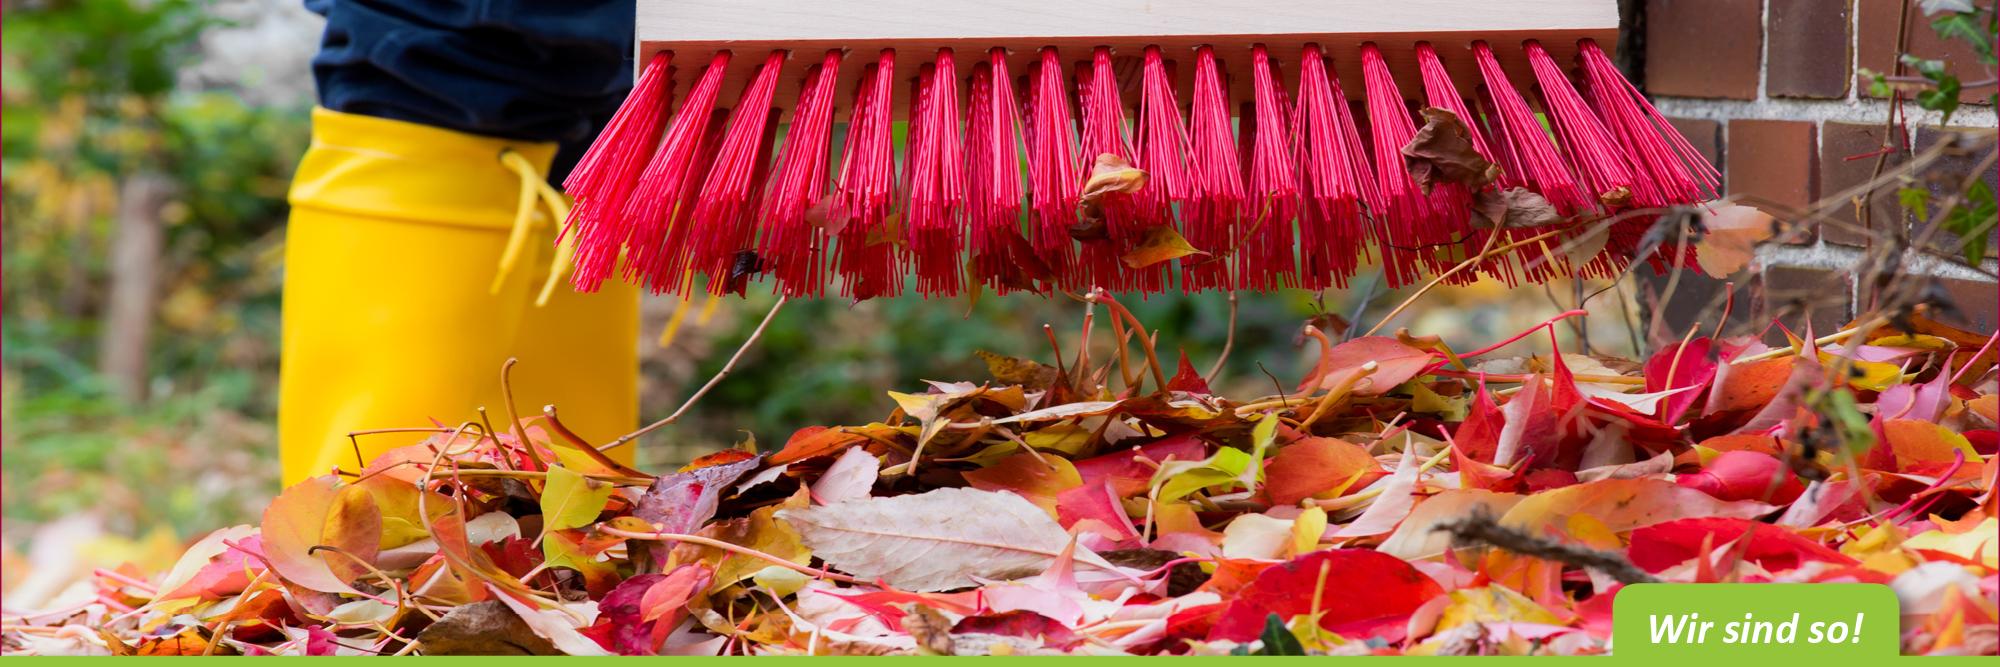 Laub entsorgen im Herbst – flotte-eifel-besen.de